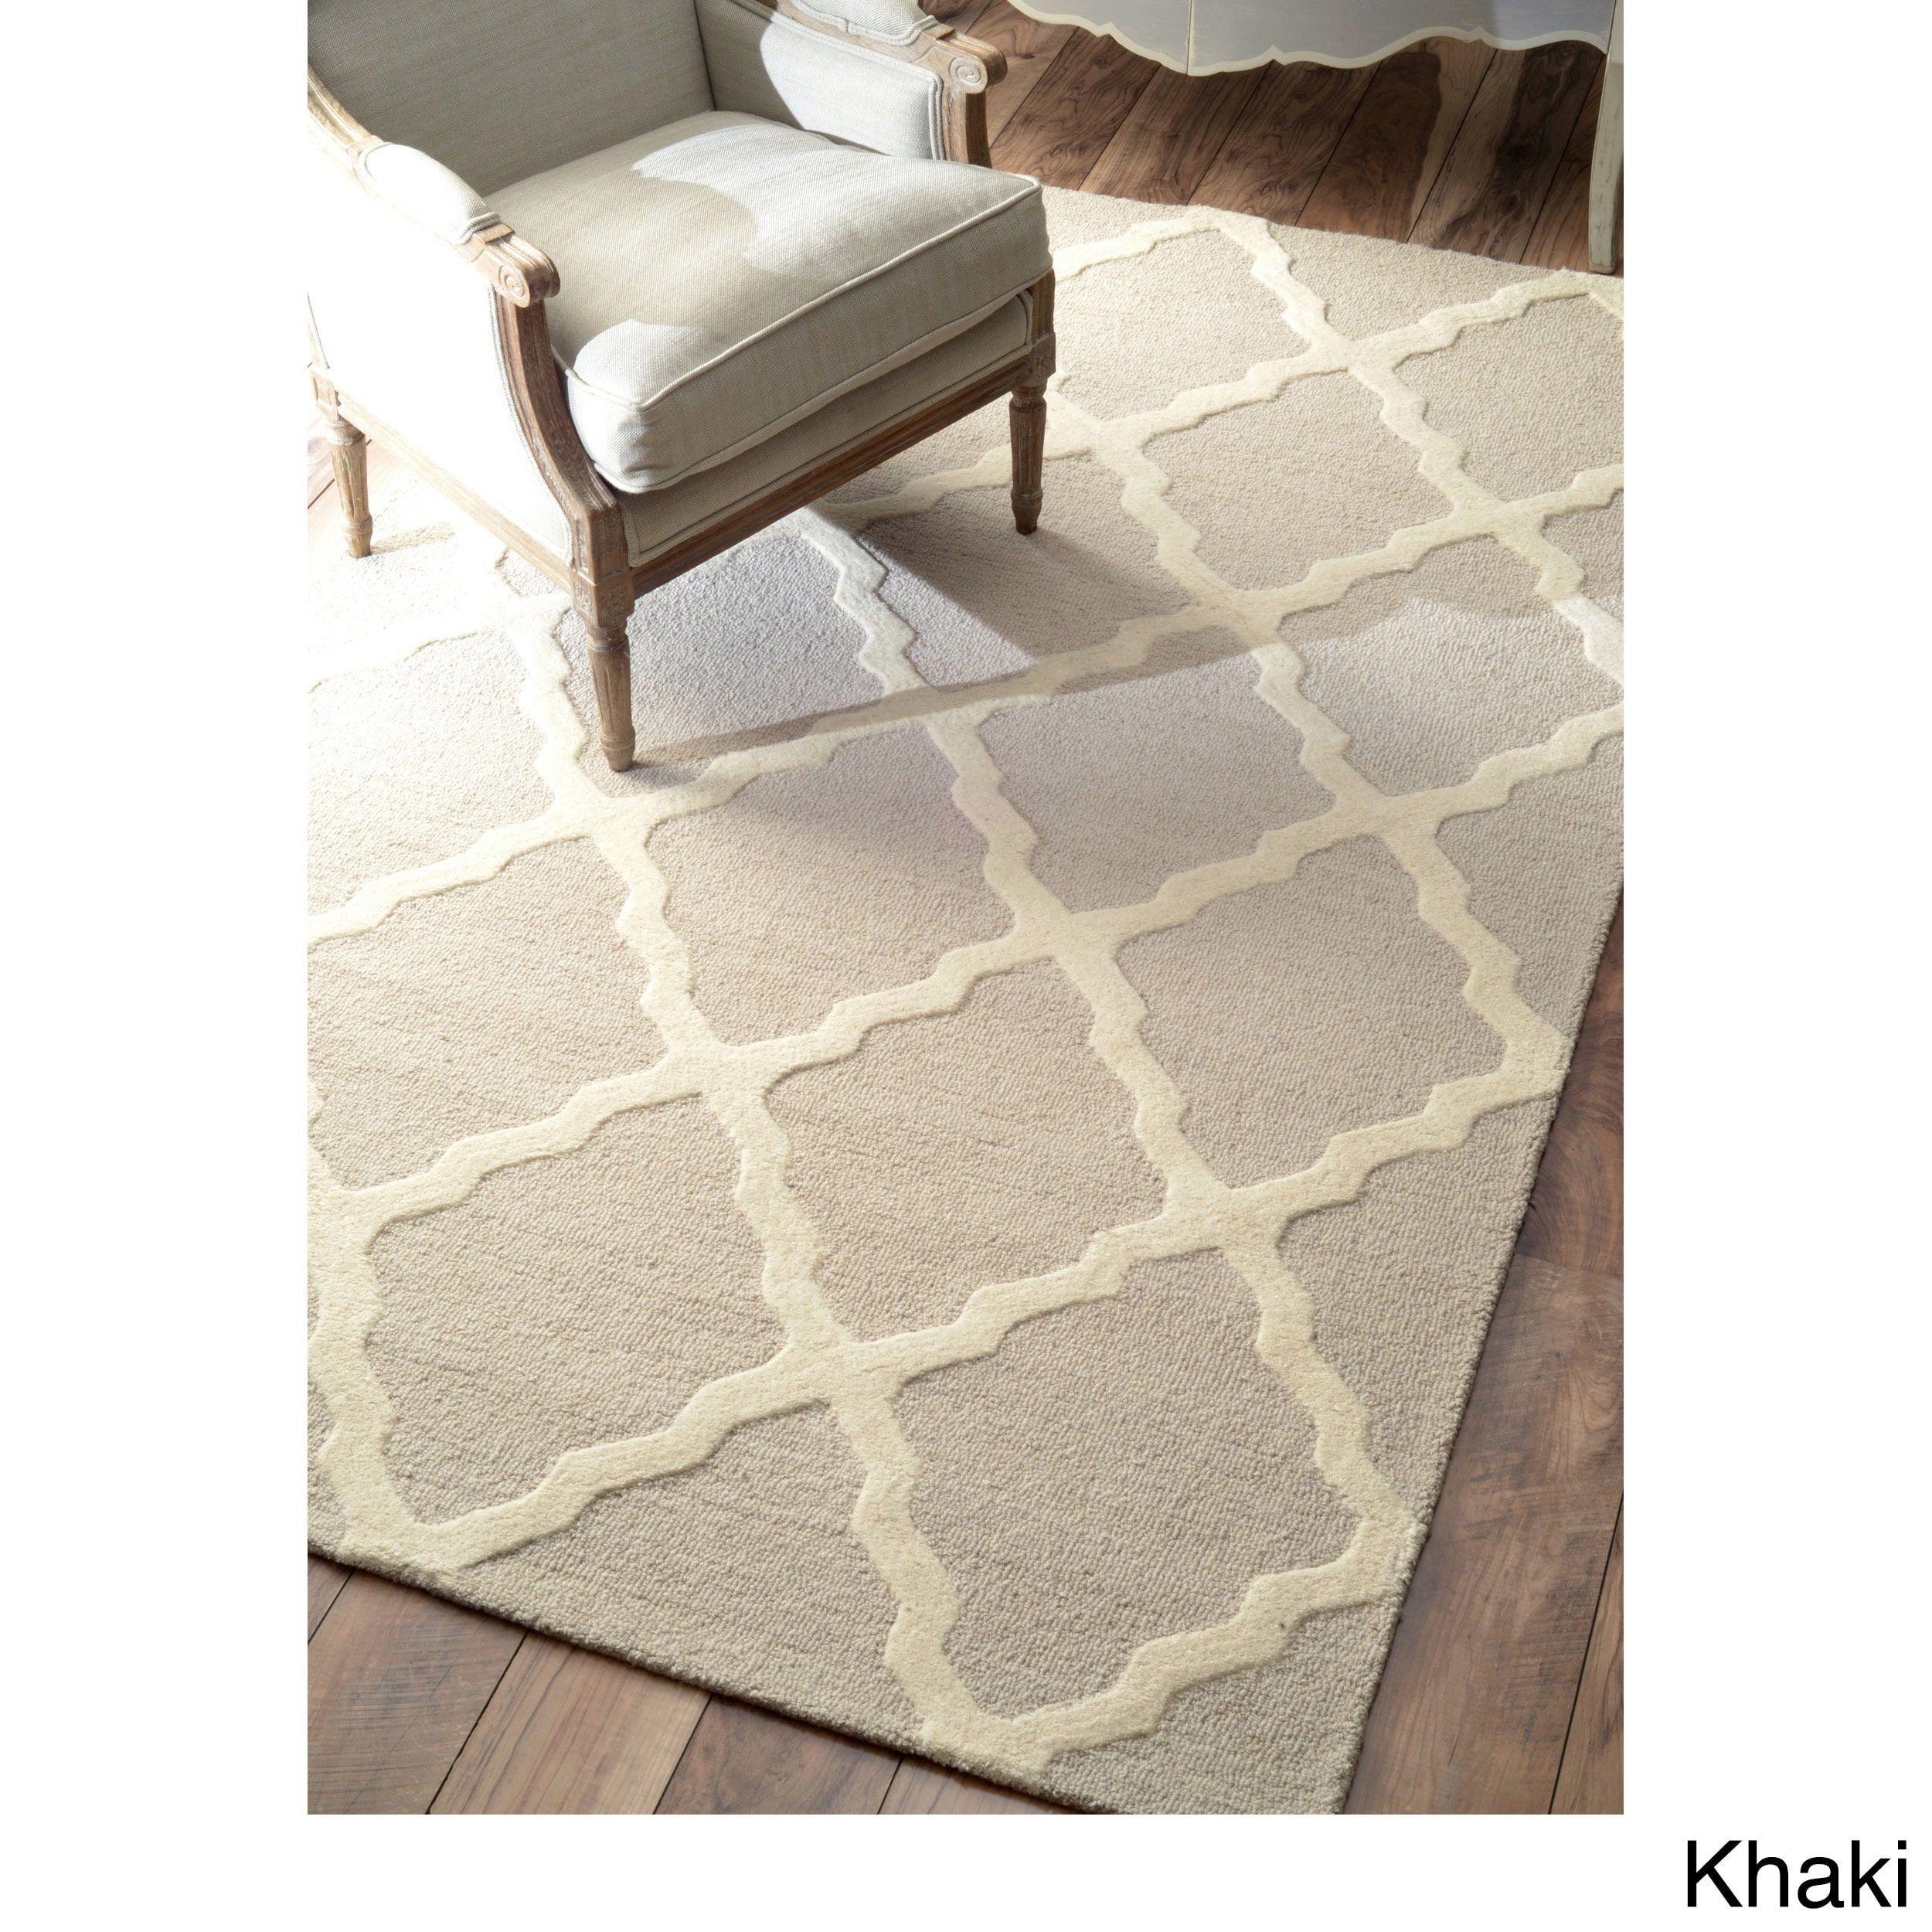 Nuloom hand hooked alexa moroccan trellis petit point wool rug 8 39 6 x 11 39 6 khaki green - Alfombras contemporaneas ...